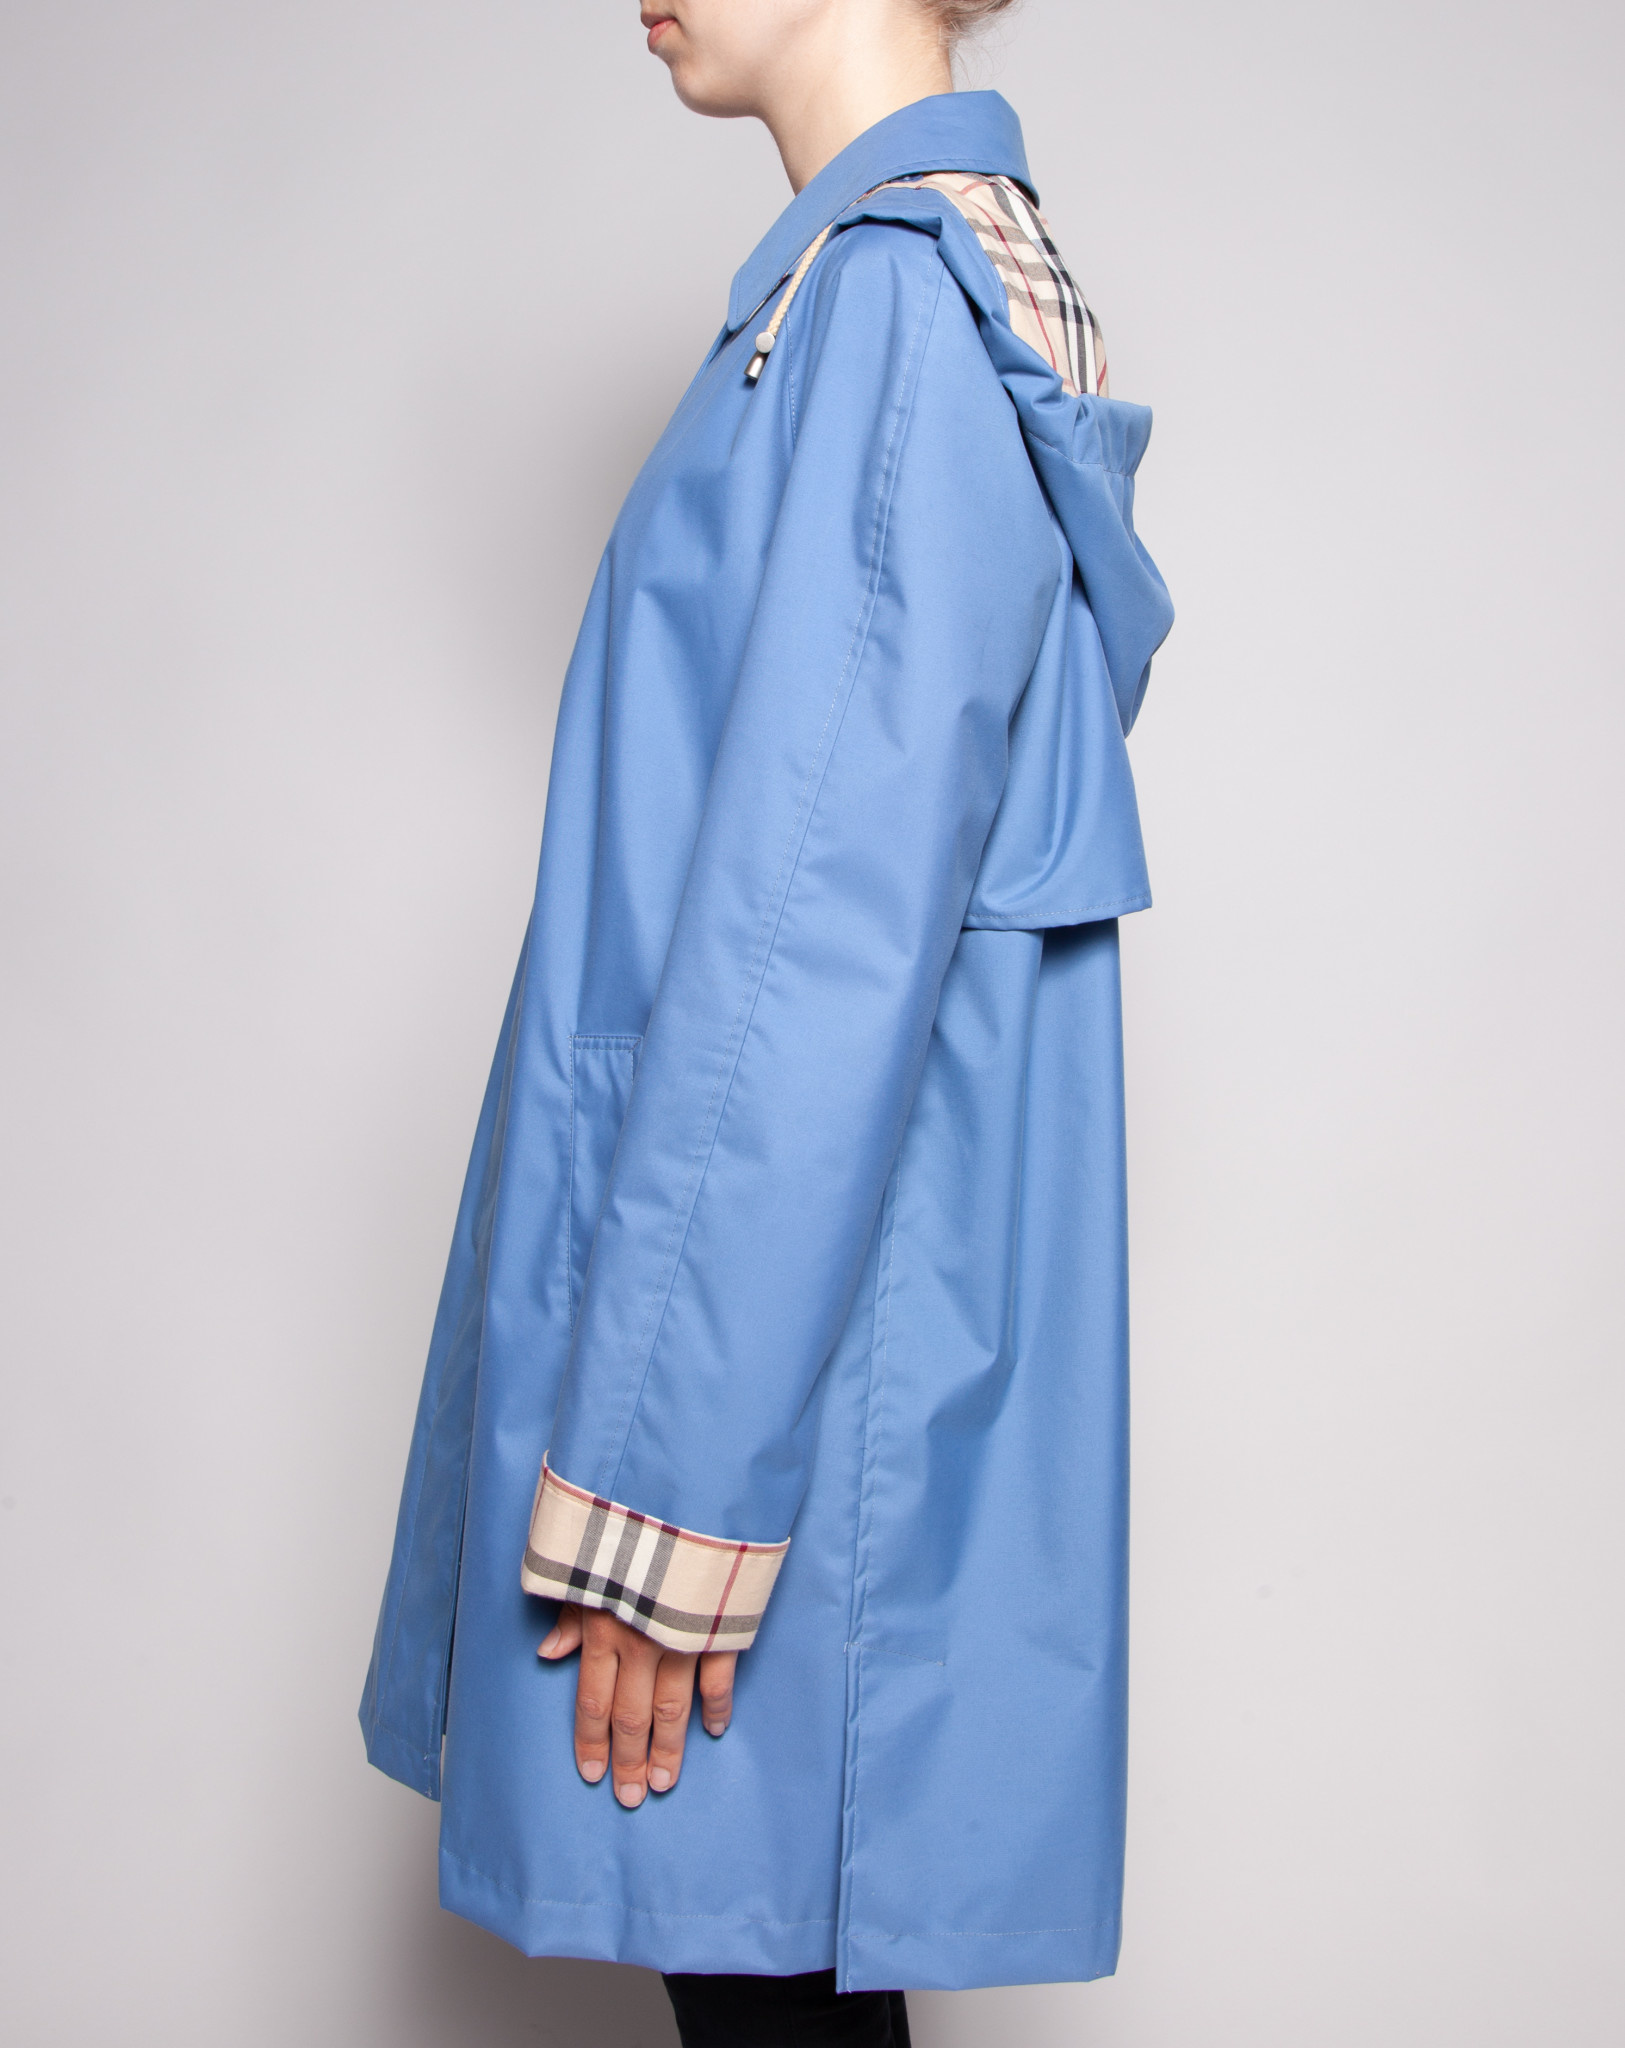 Burberry BLUE TRENCH (LINING: BURBERRY MONOGRAM)